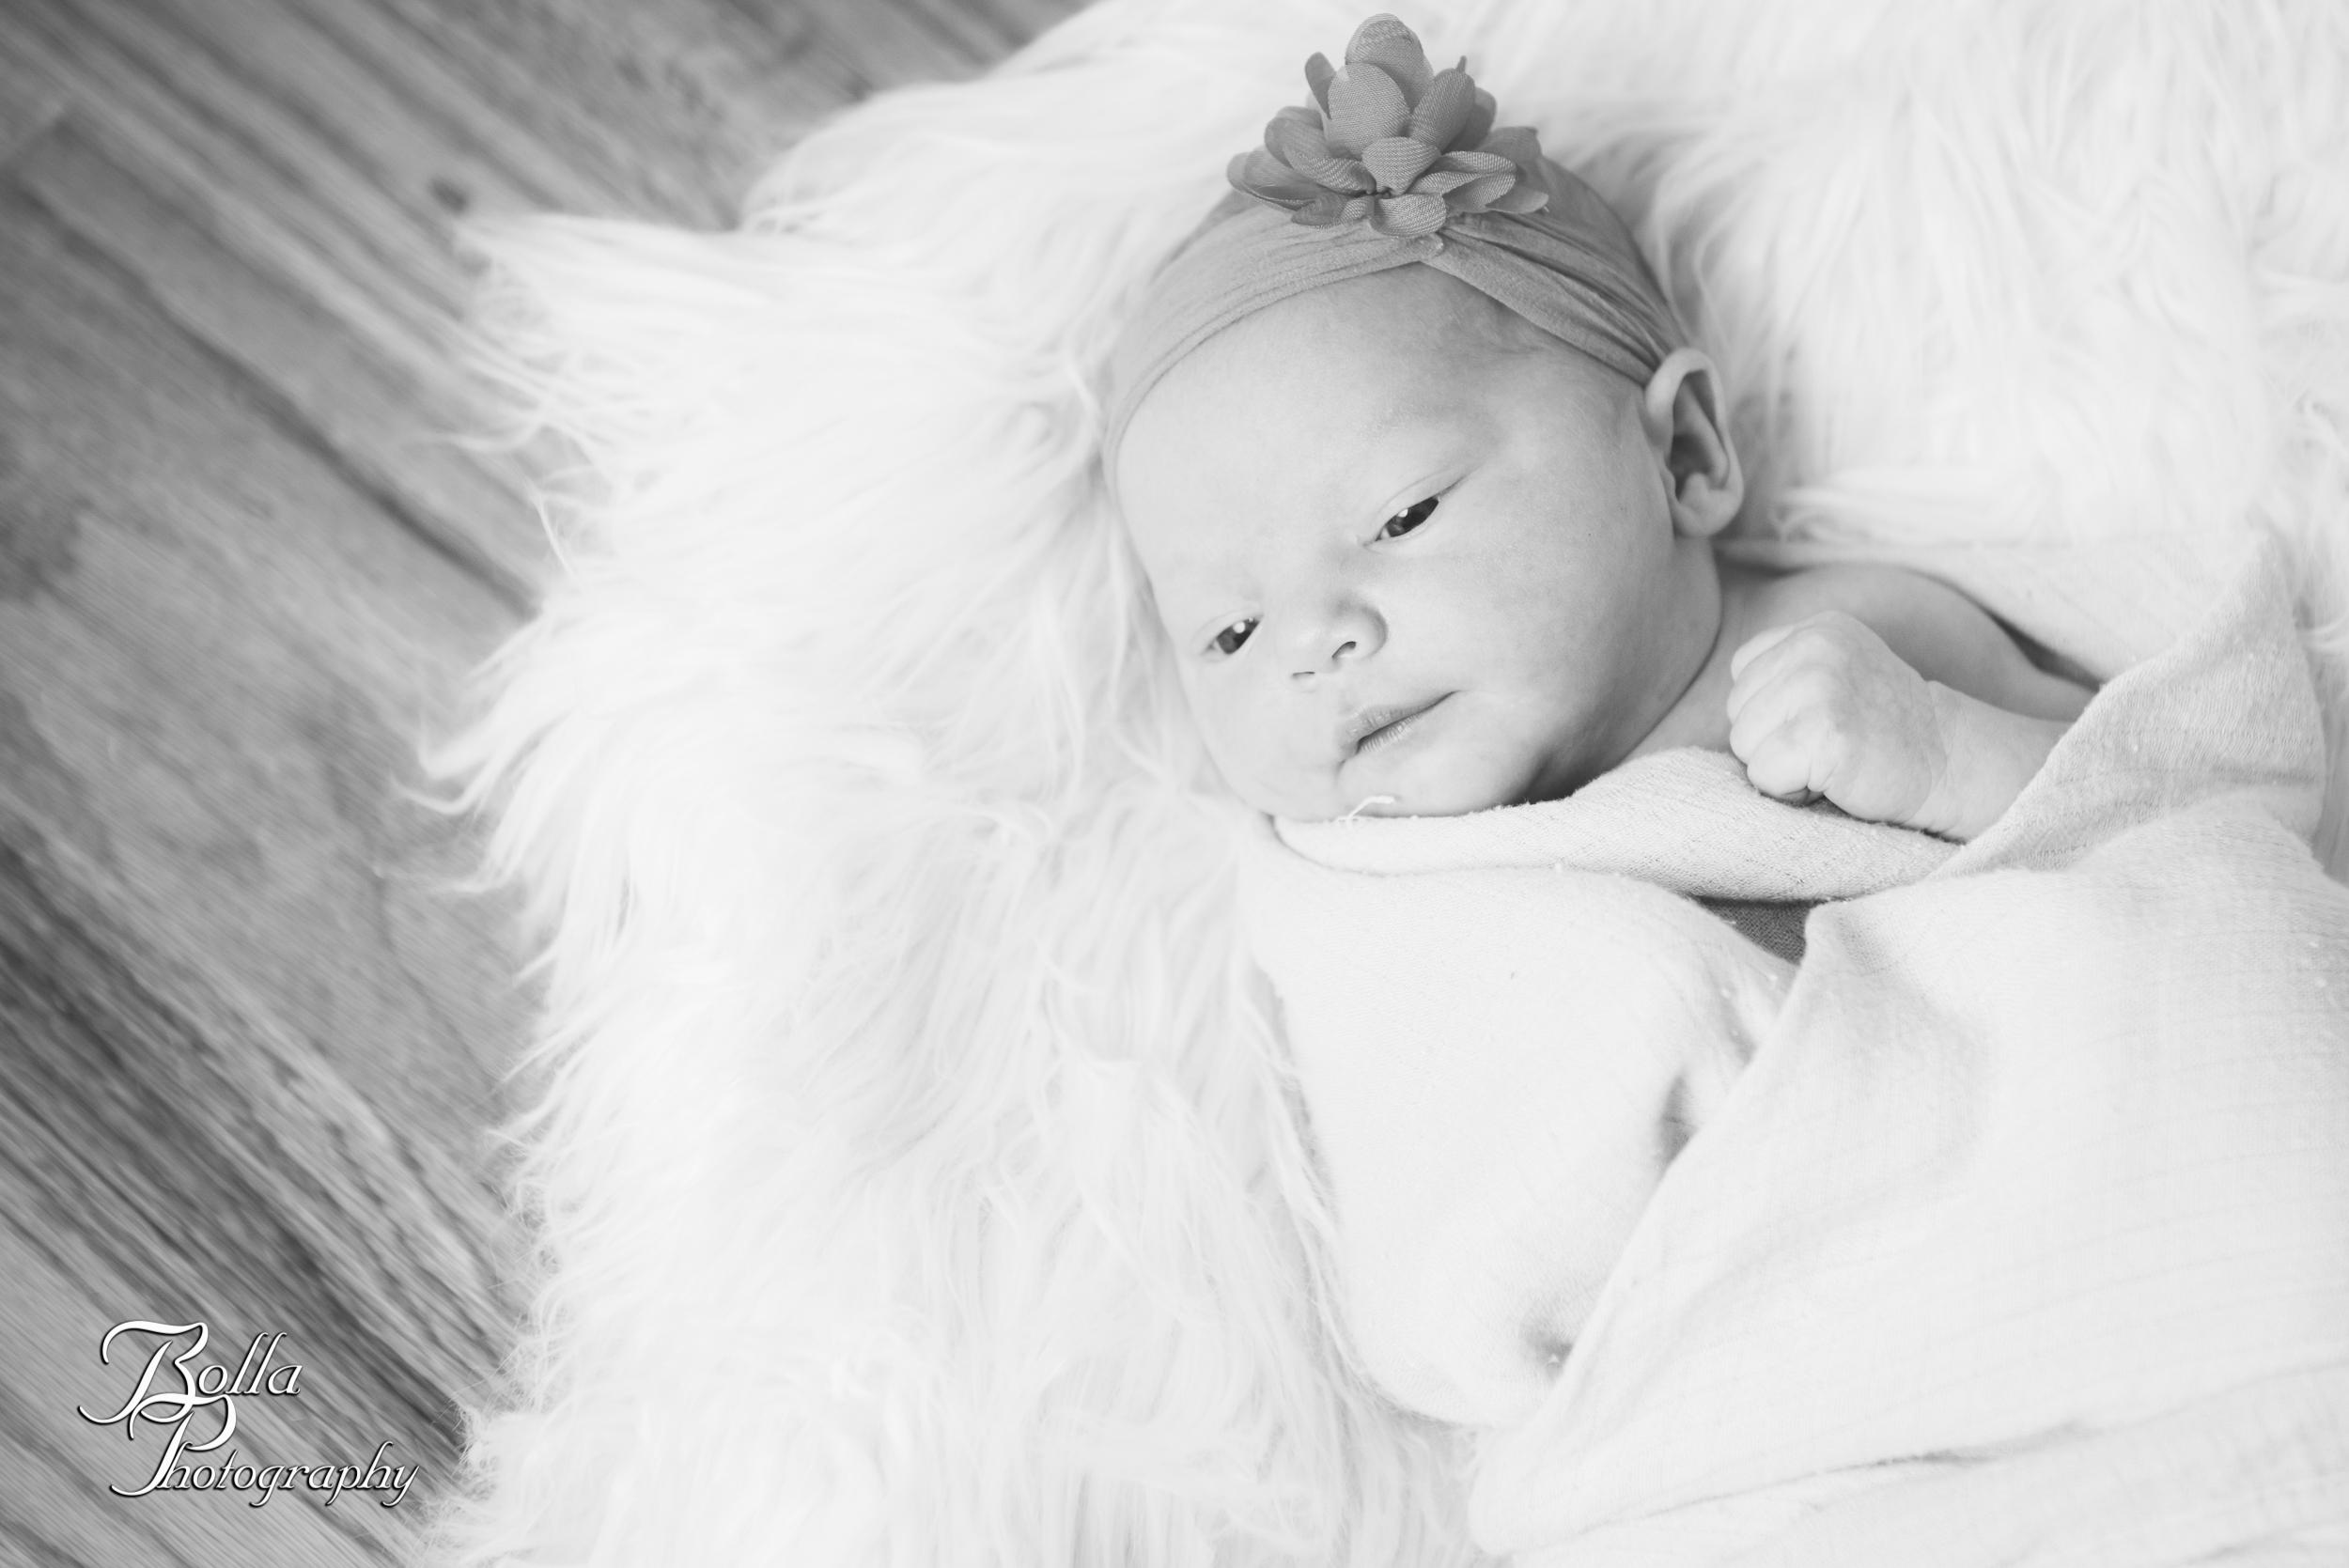 20170820_Bolla photography edwardsville wedding newborn baby photographer st louis weddings babies-2.jpg